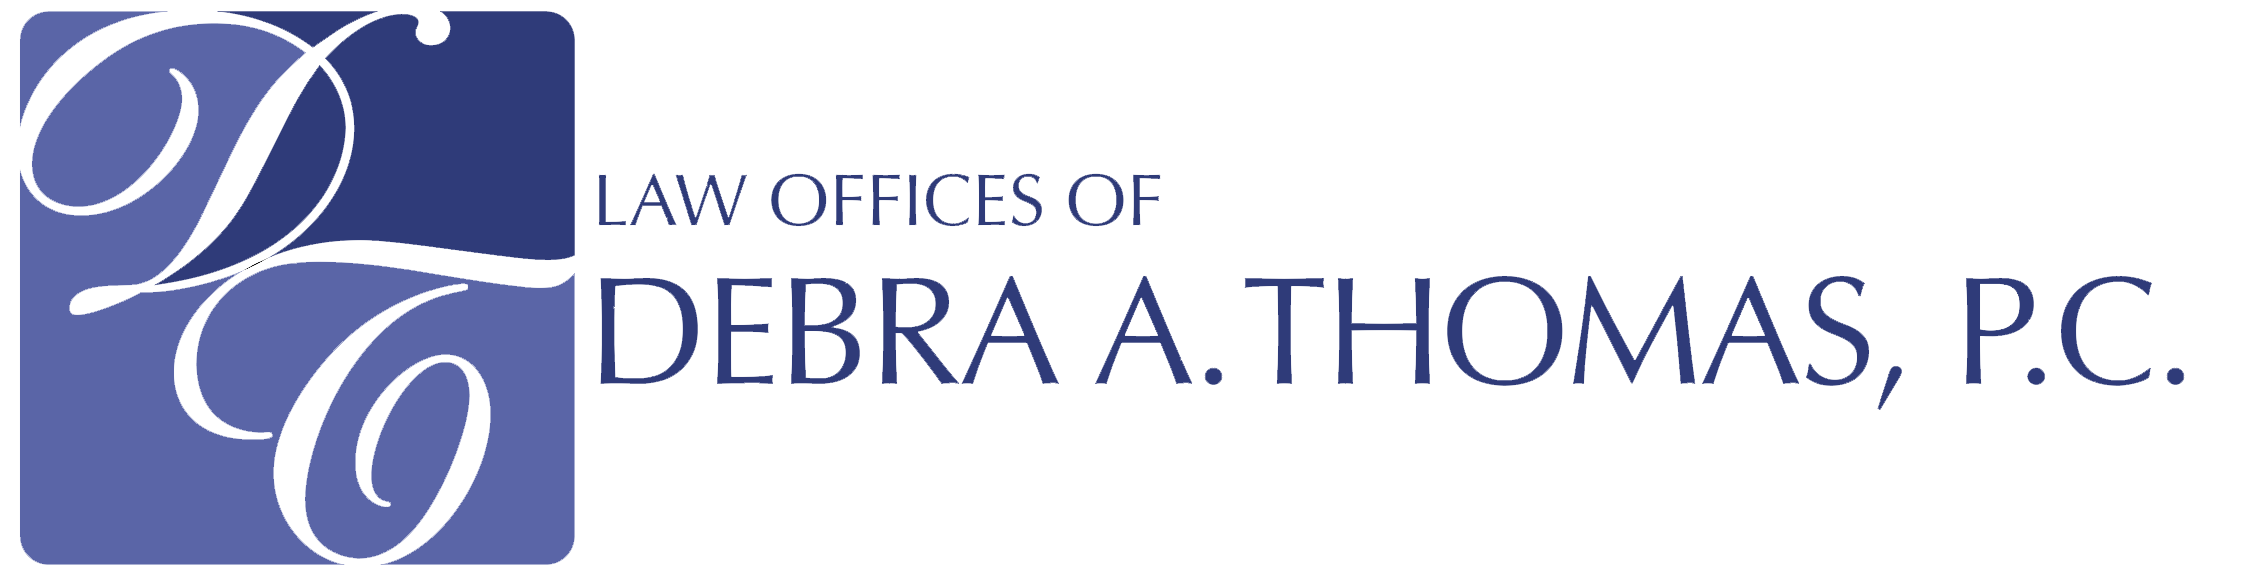 Law Offices of Debra A. Thomas - logo